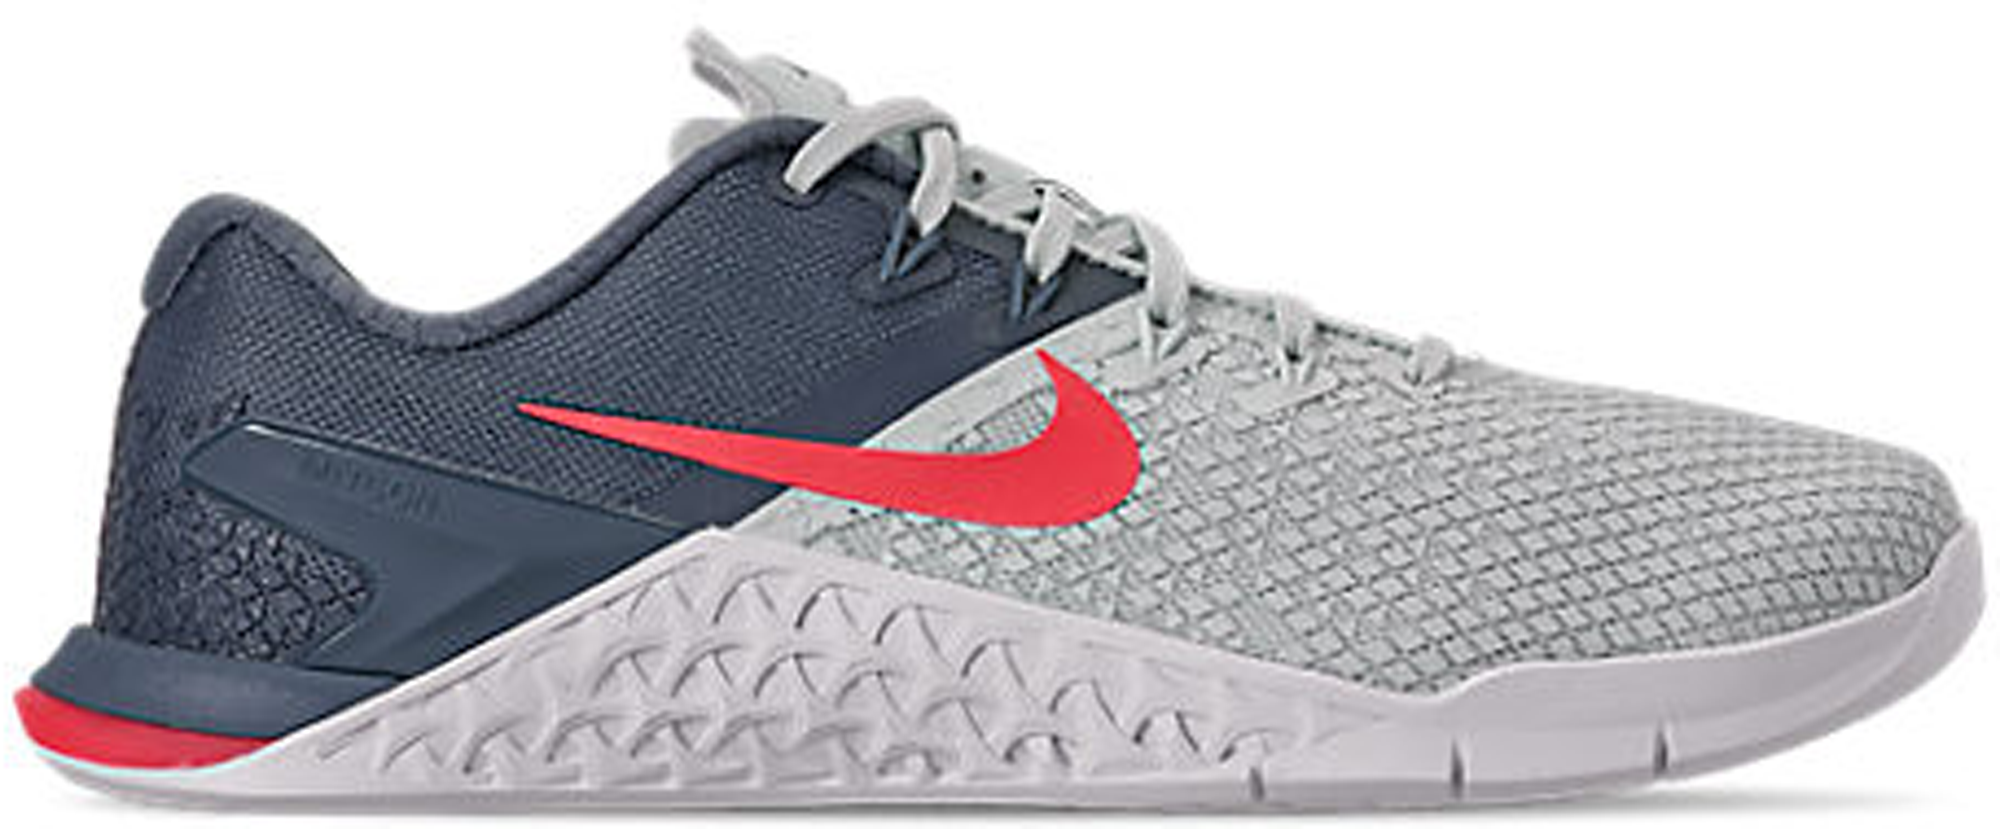 Nike Metcon 4 XD Barely Grey Ember Glow